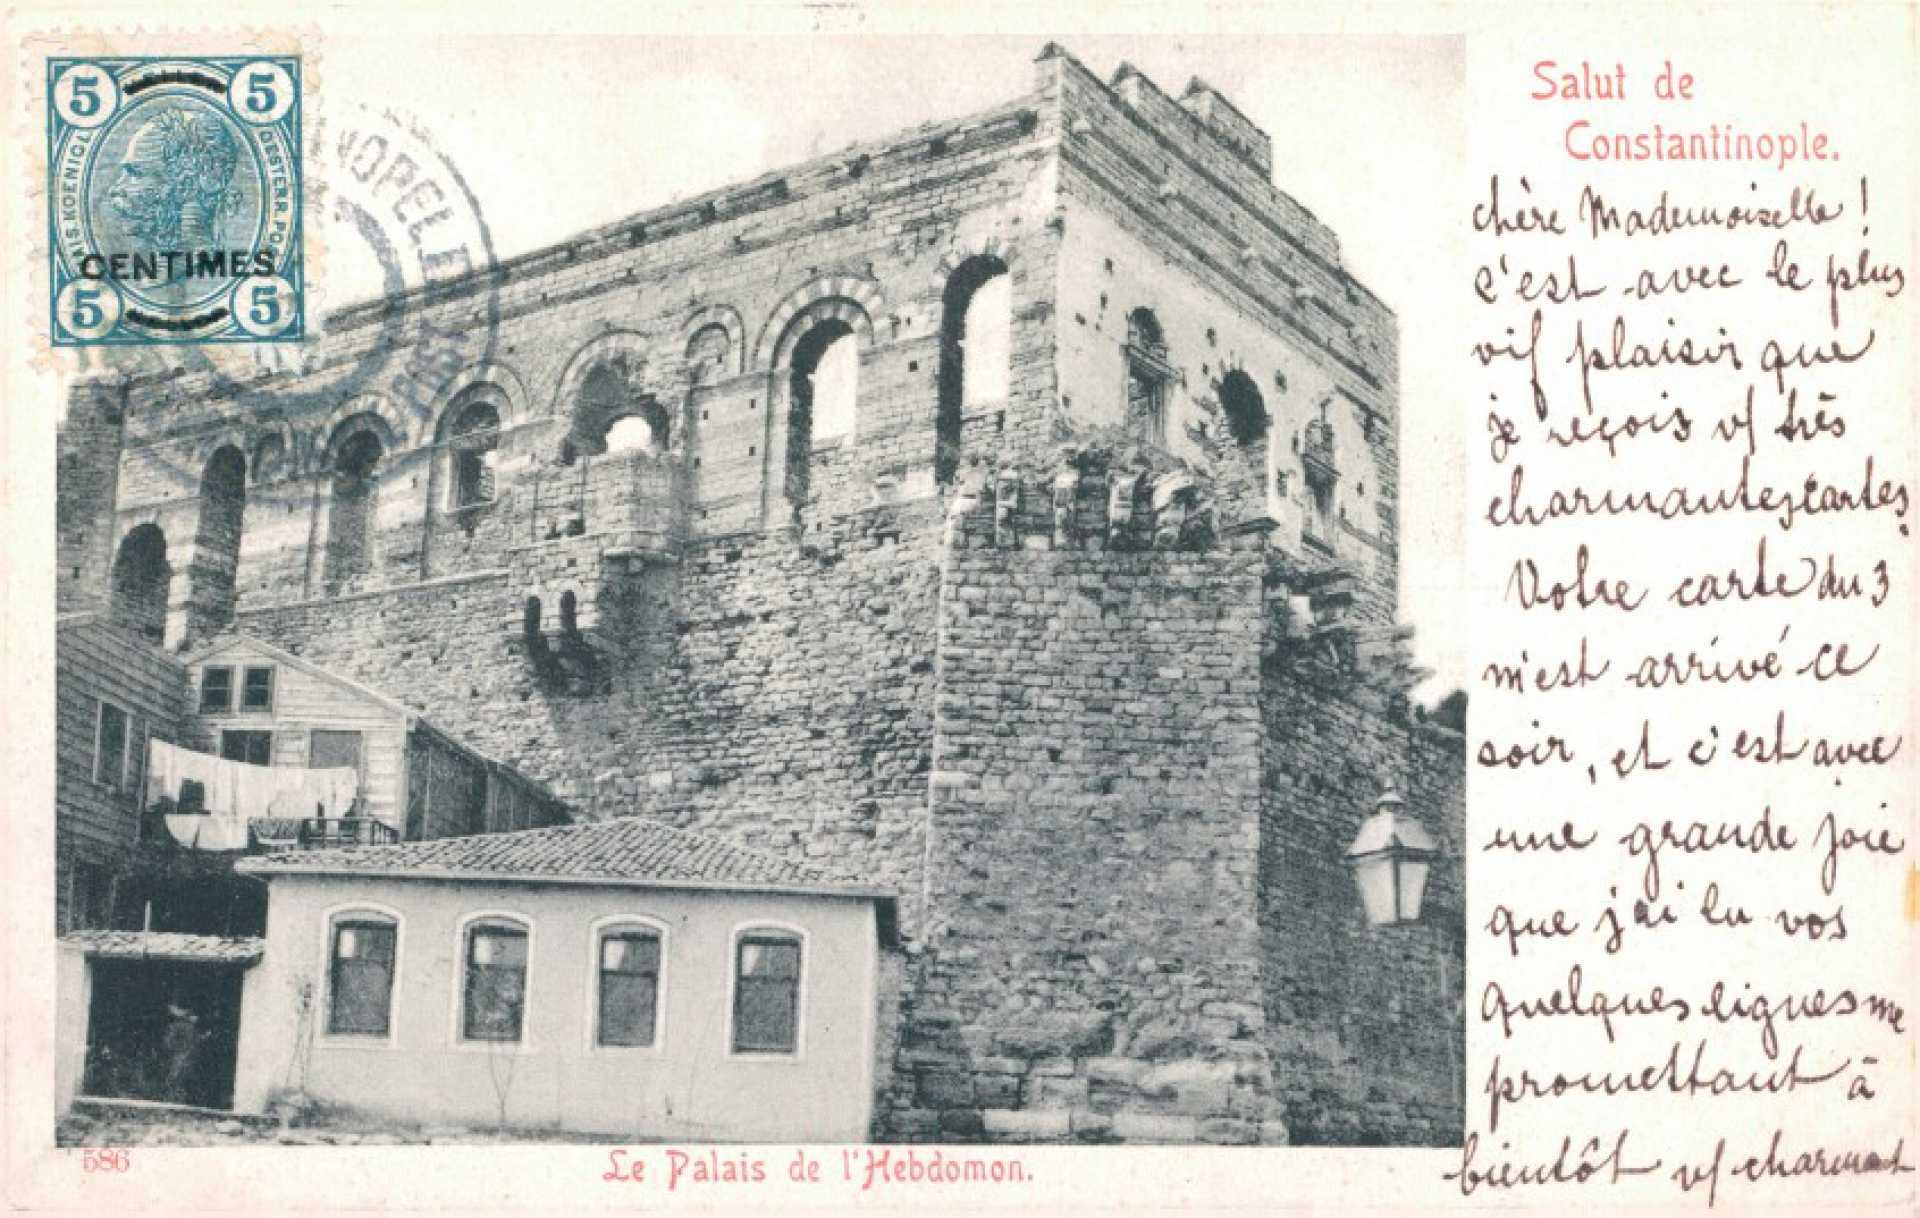 Le Palais de l'Hebdomon